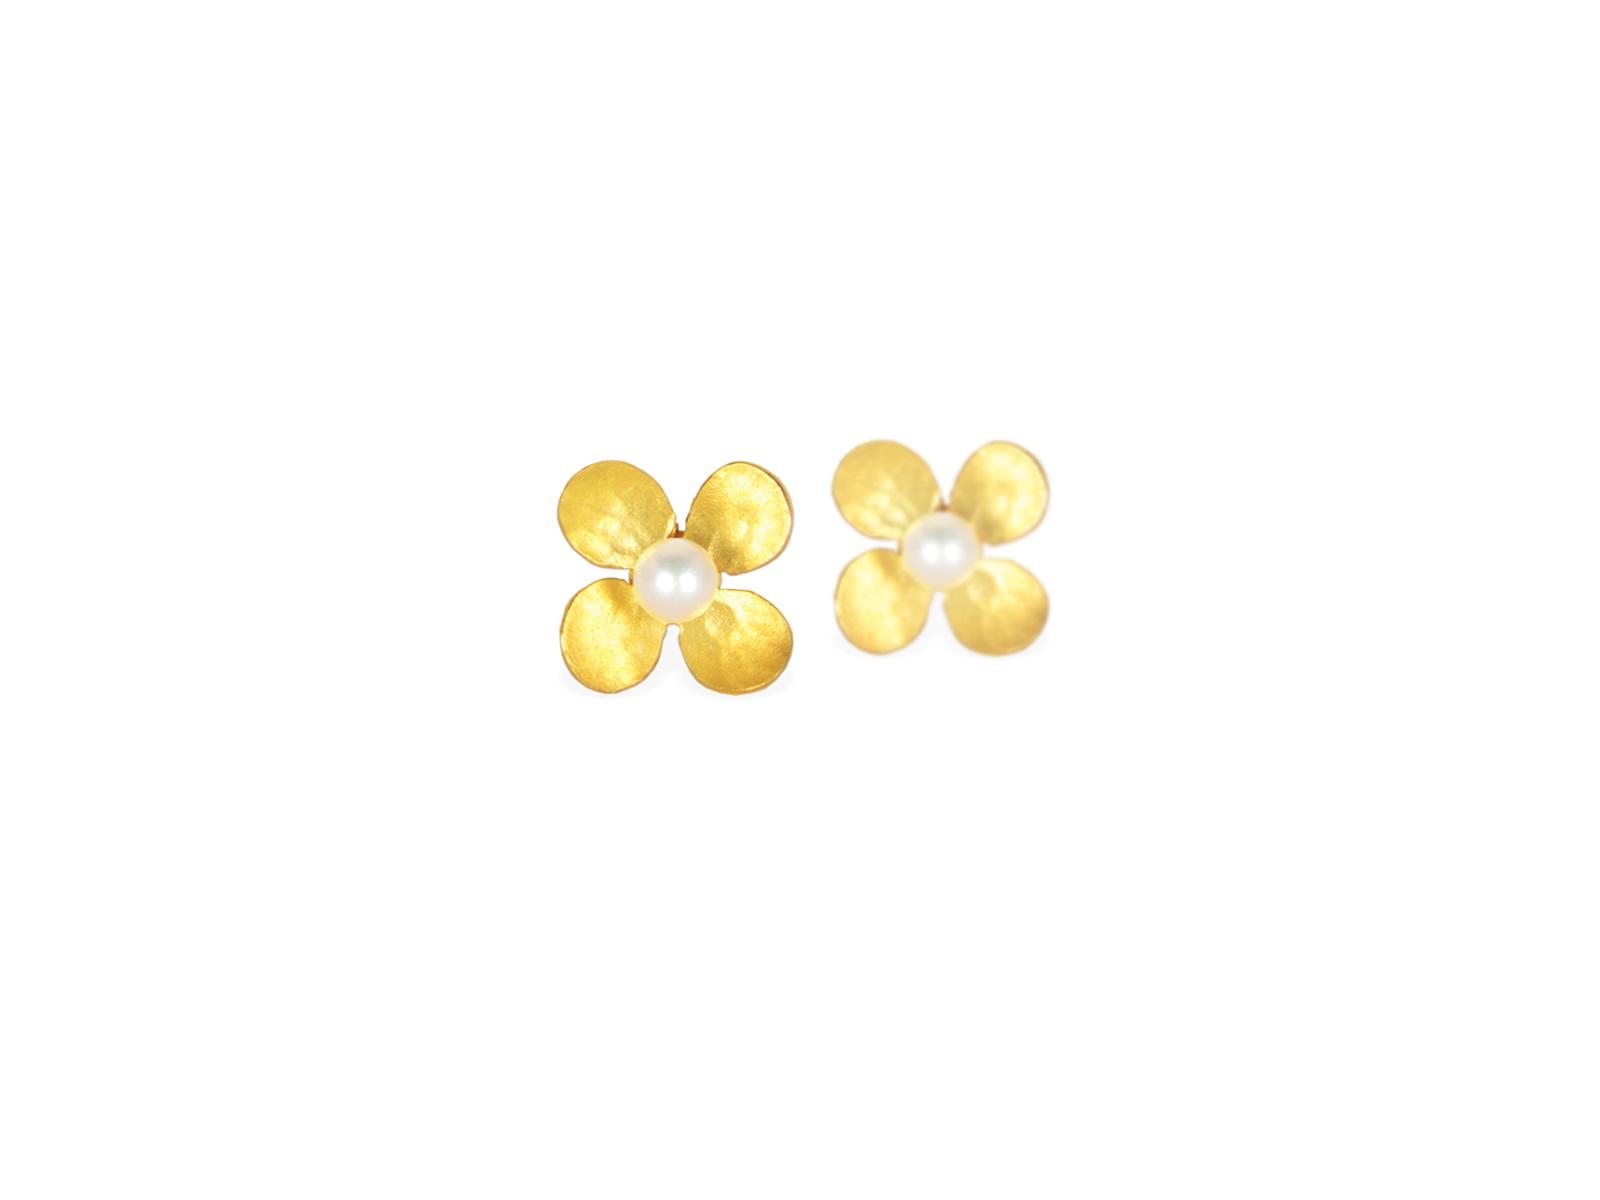 Ohrstecker-Gold-Verena-Brack